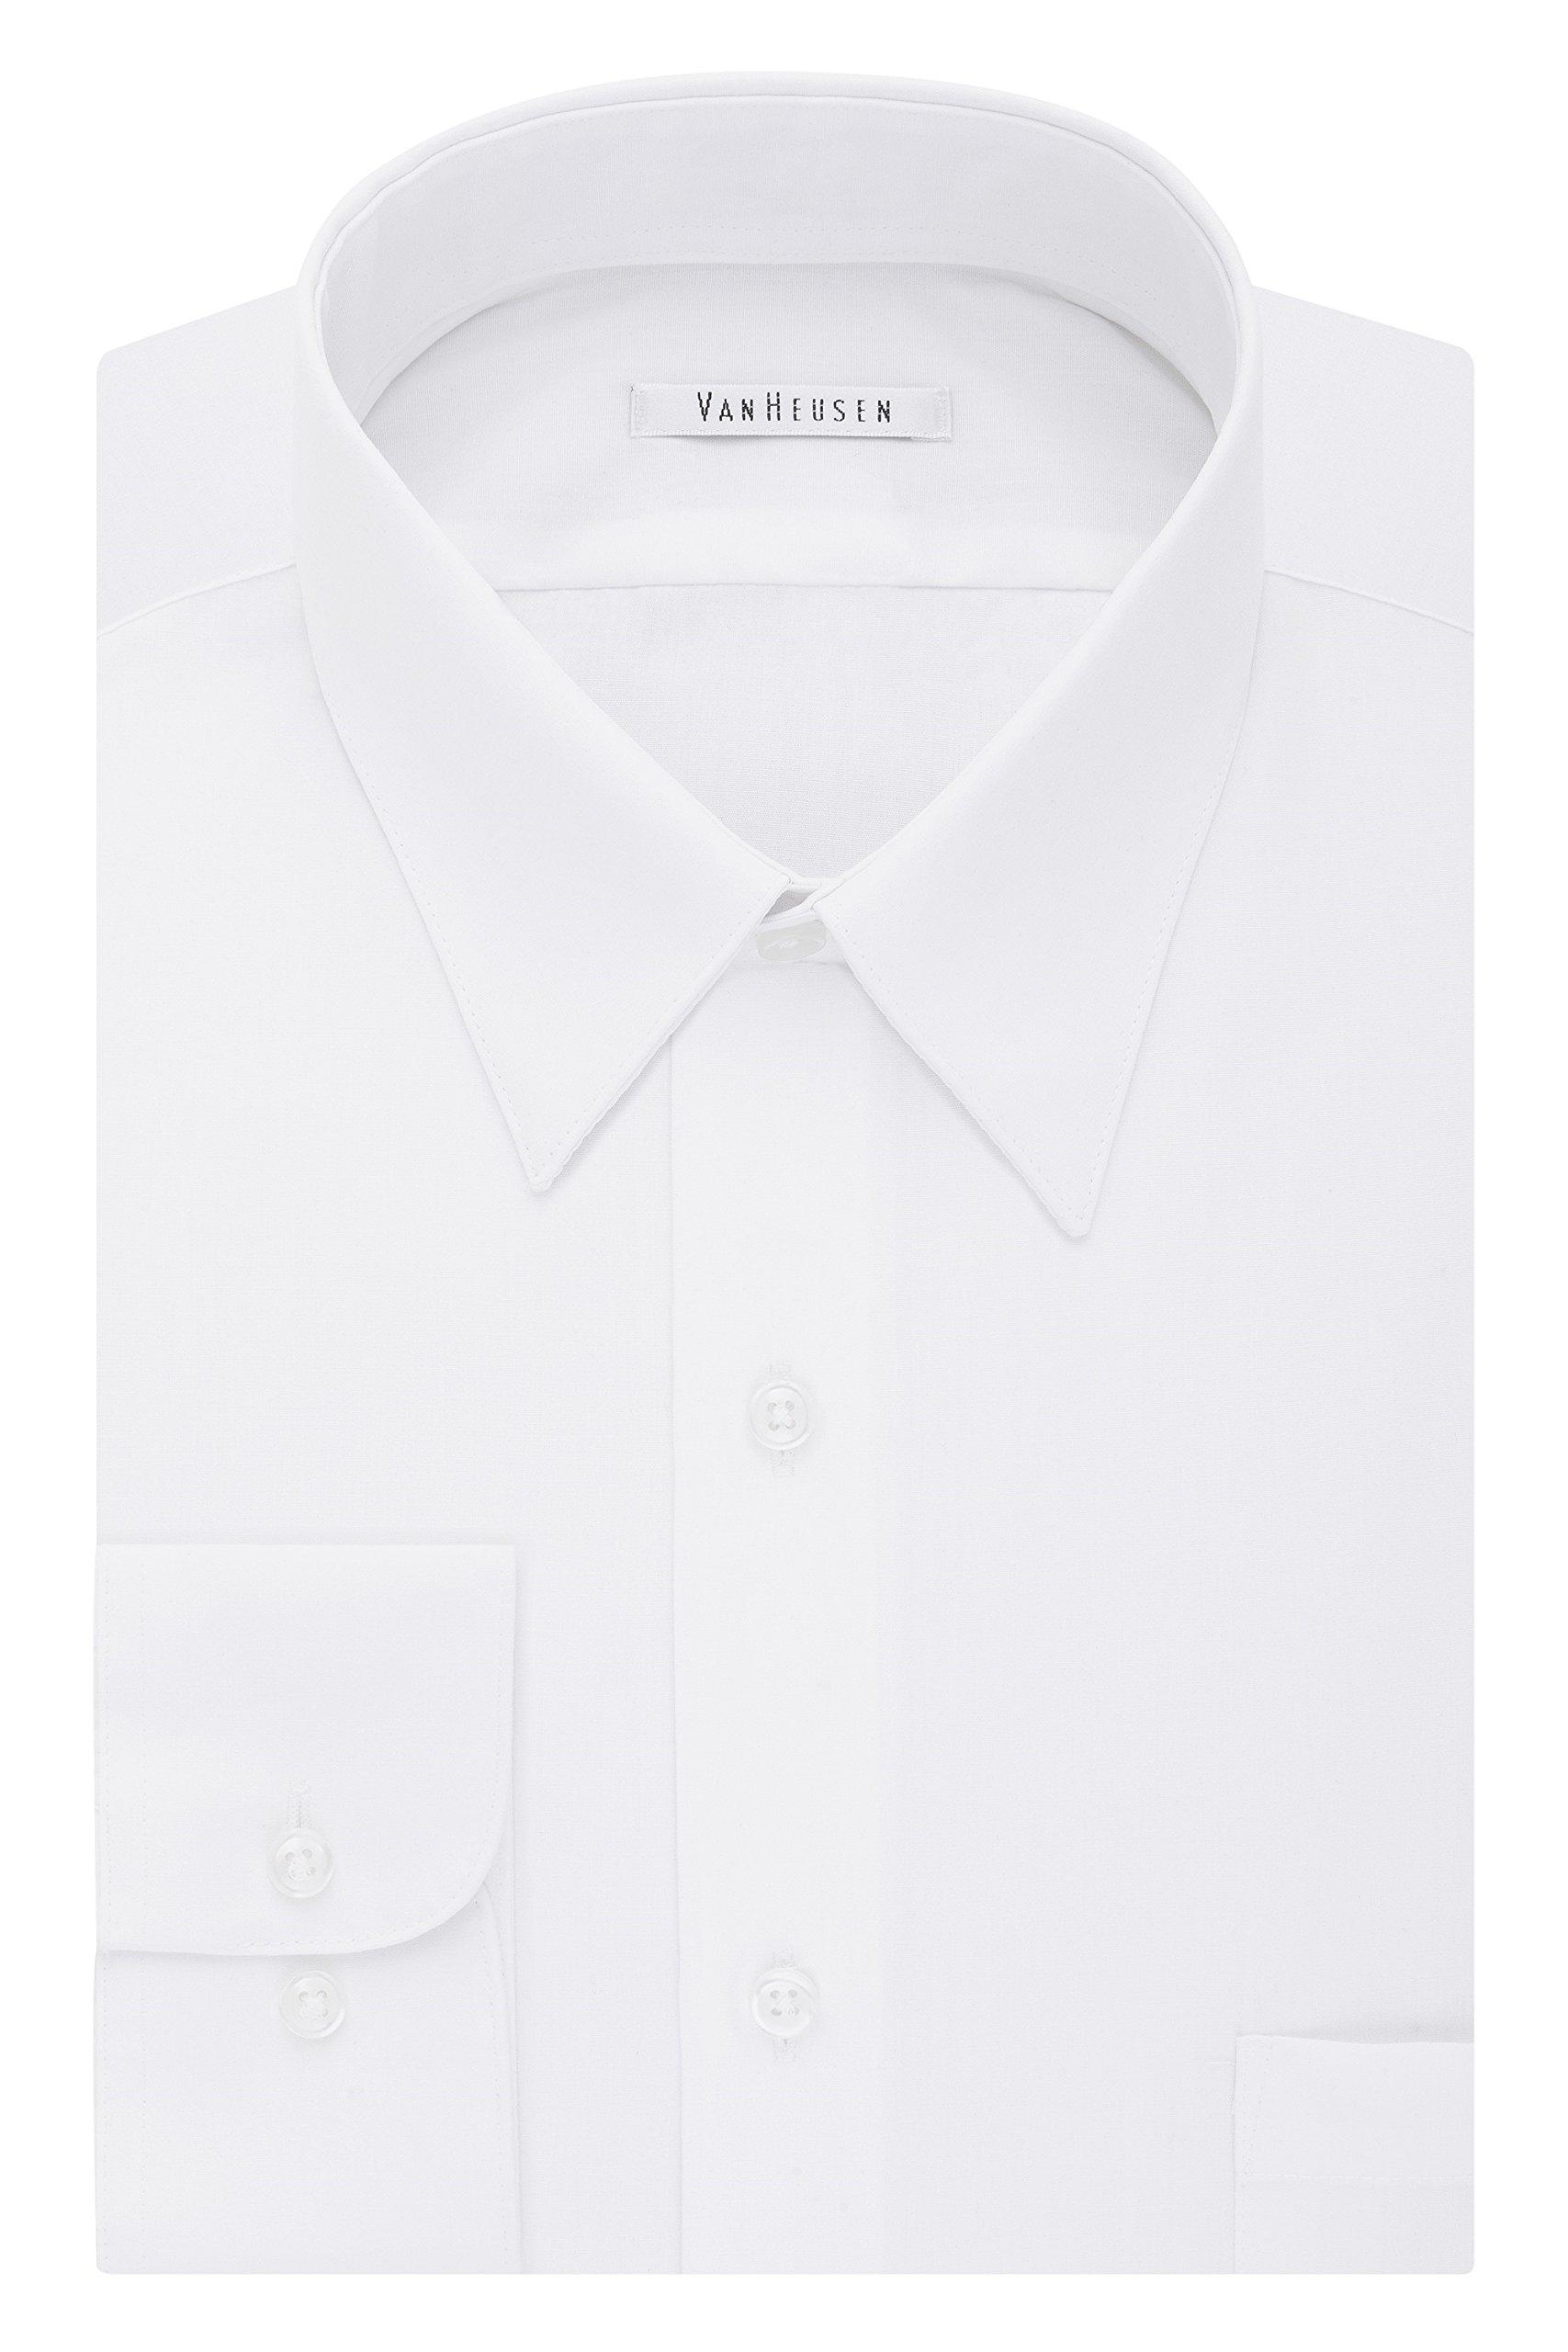 Van Heusen Men's Tall Dress Shirt Big Fit Poplin, White, 19'' Neck 34''-35'' Sleeve